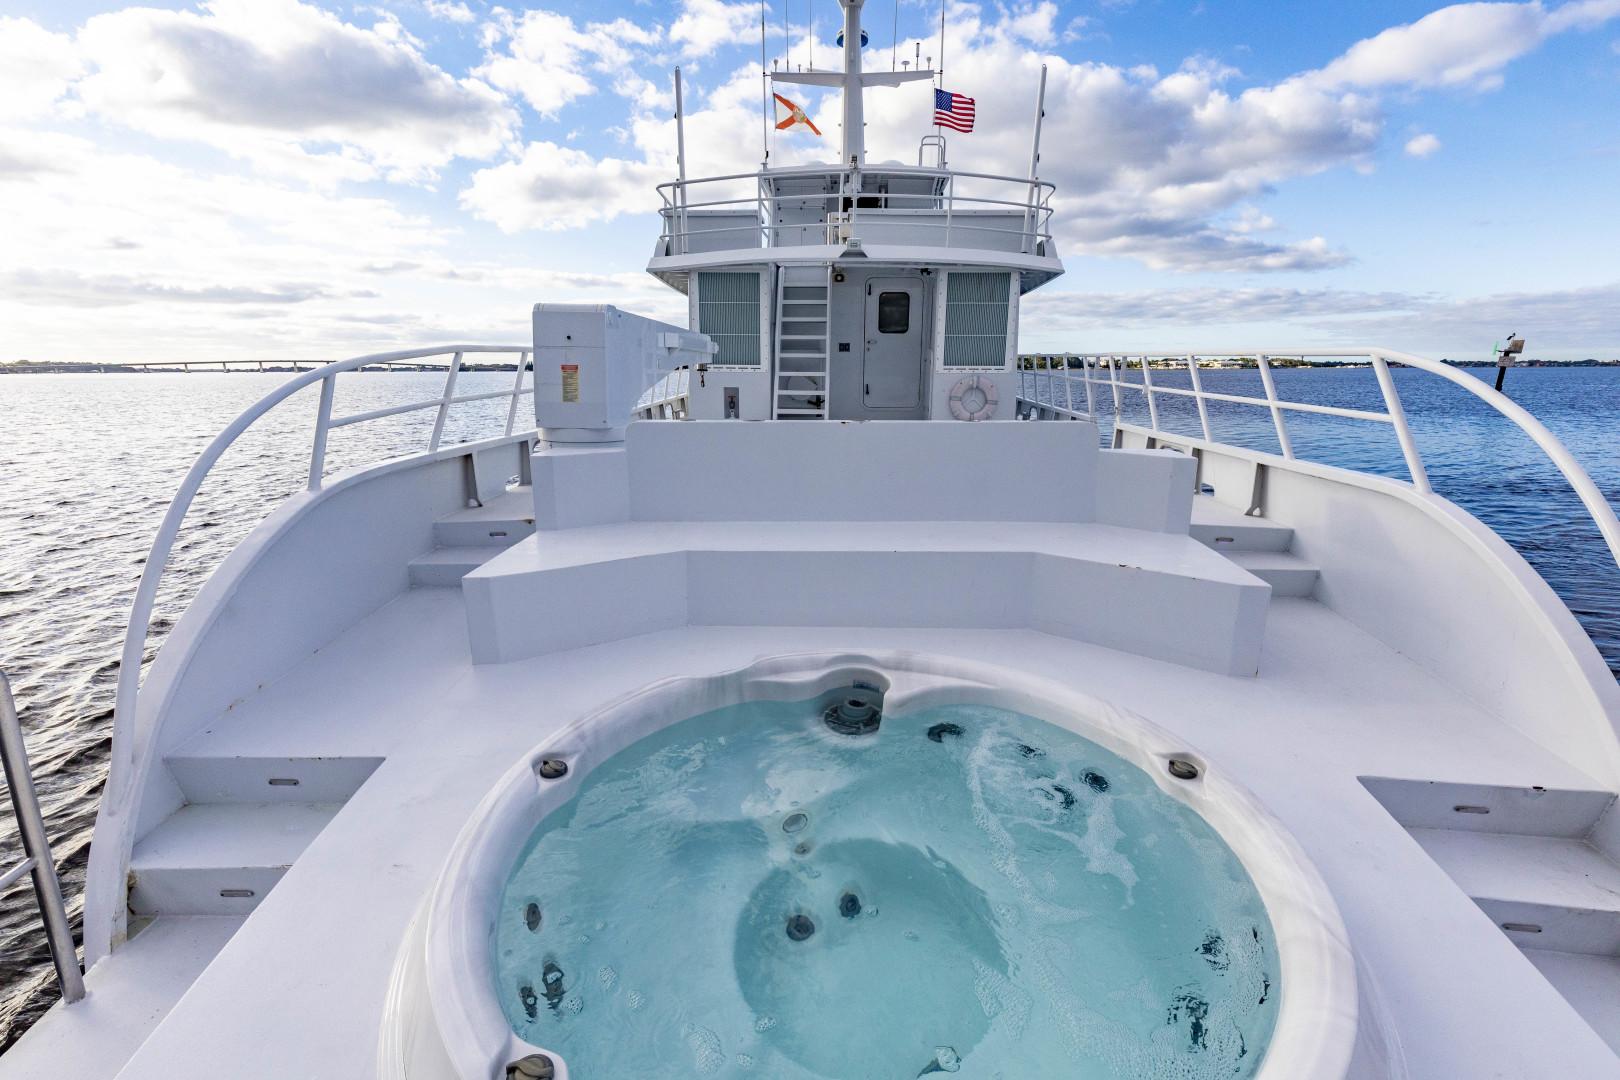 GlassTech-Expedition Yacht 2018-Reset Stuart-Florida-United States-Hot Tub-1568562 | Thumbnail